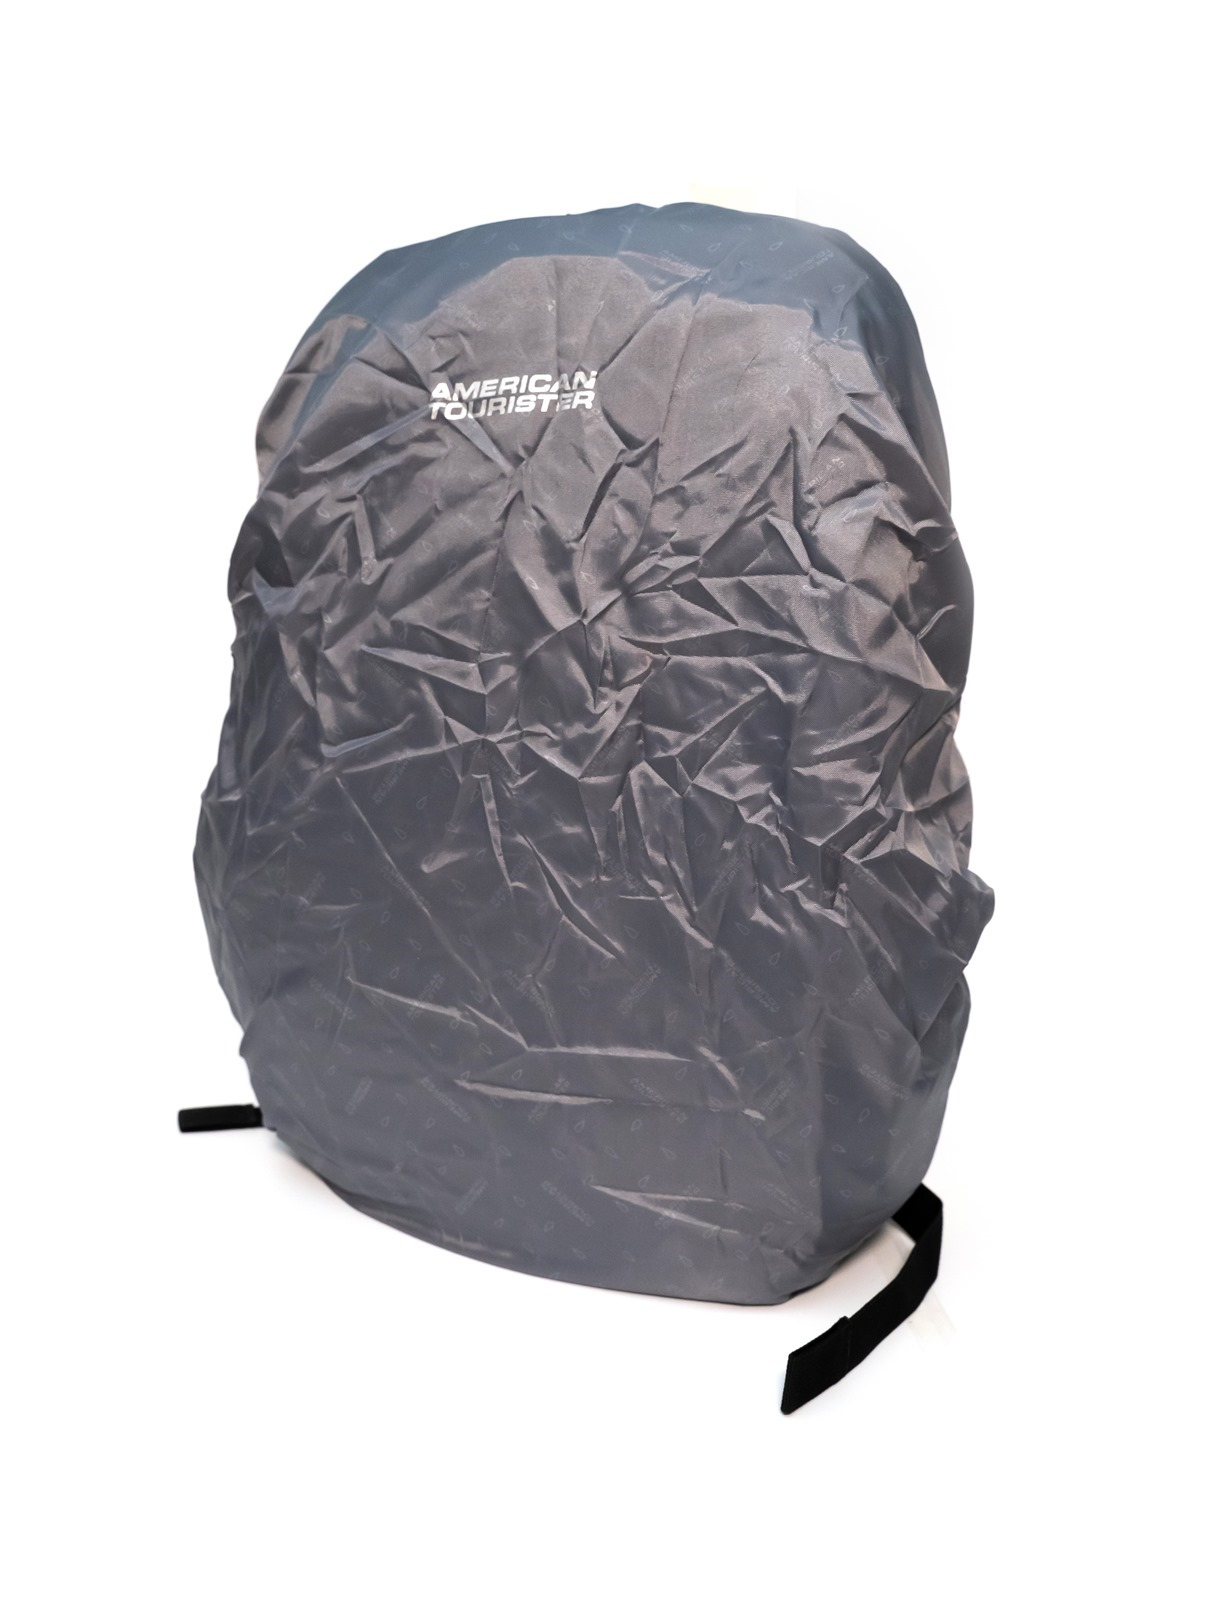 3C 型男不可或缺的 AT 美國旅行者 SEGNO 多功能筆電後背包,能裝、聰明,工作出差更有型 [限時優惠團購中] @3C 達人廖阿輝